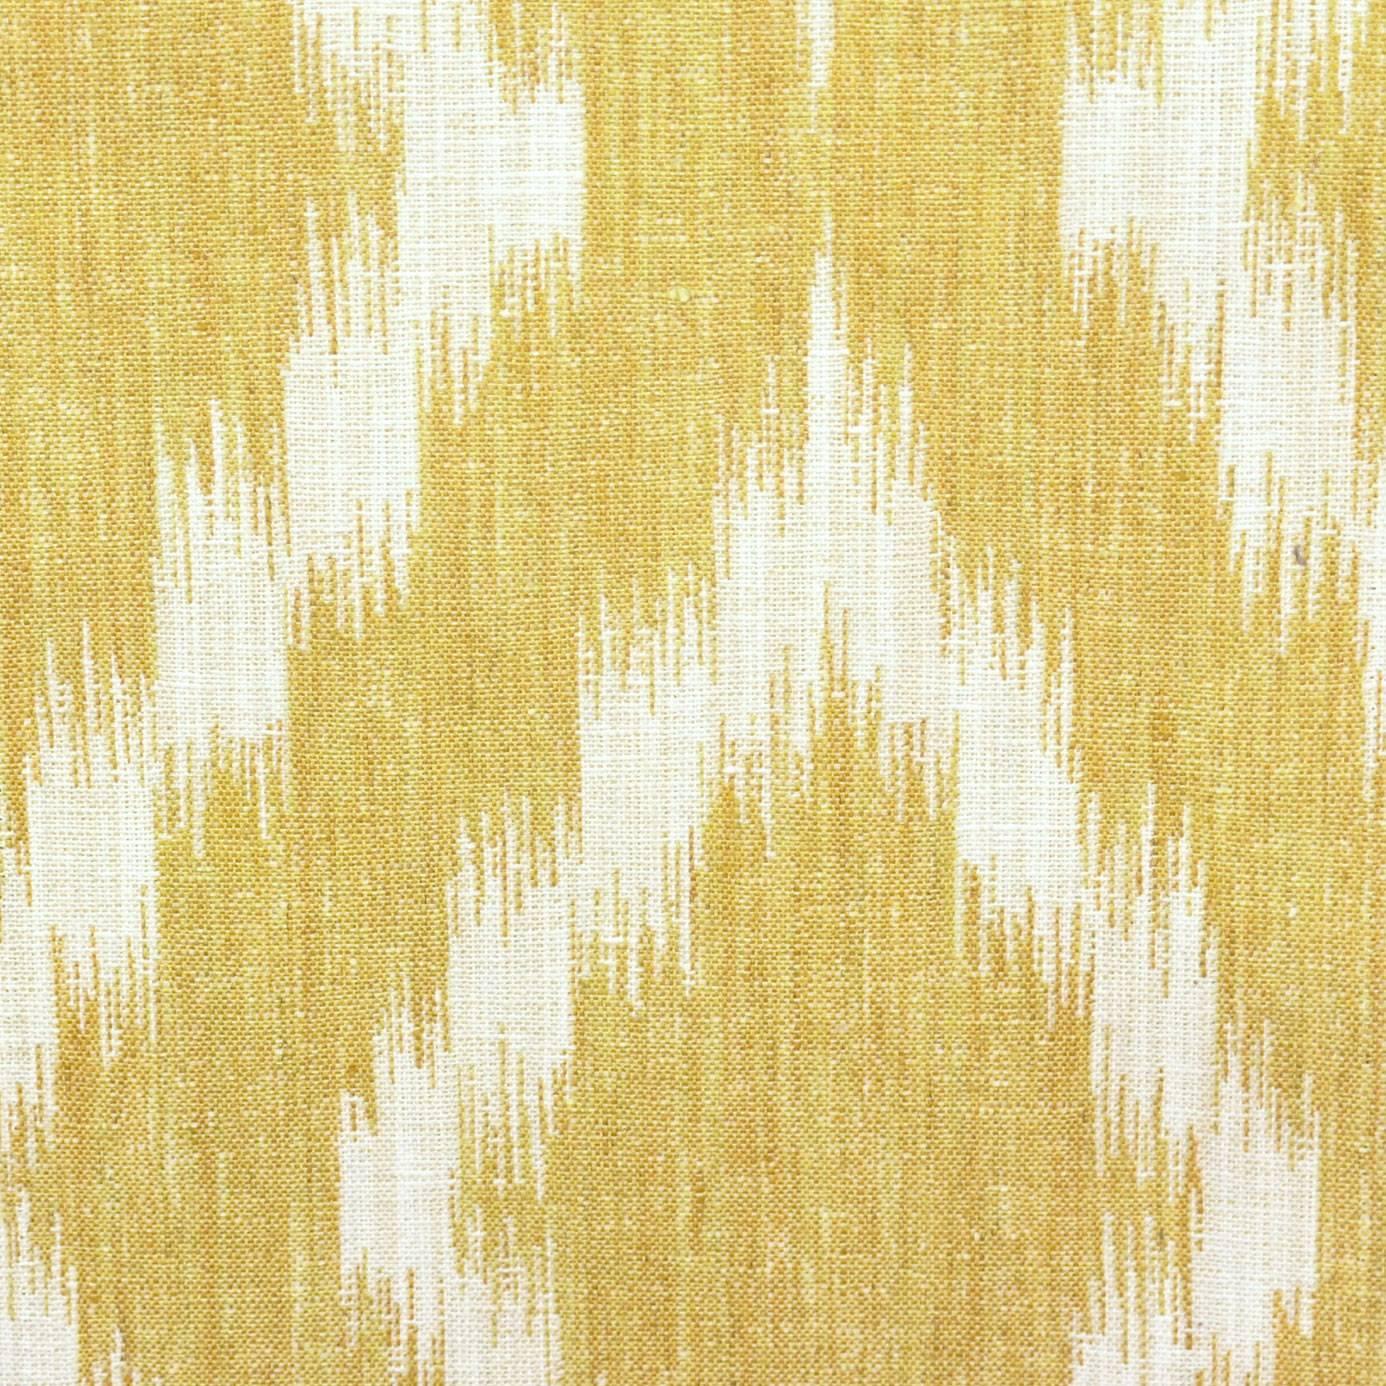 Roman Blinds In Zahira Fabric Maize 7634 07 Romo